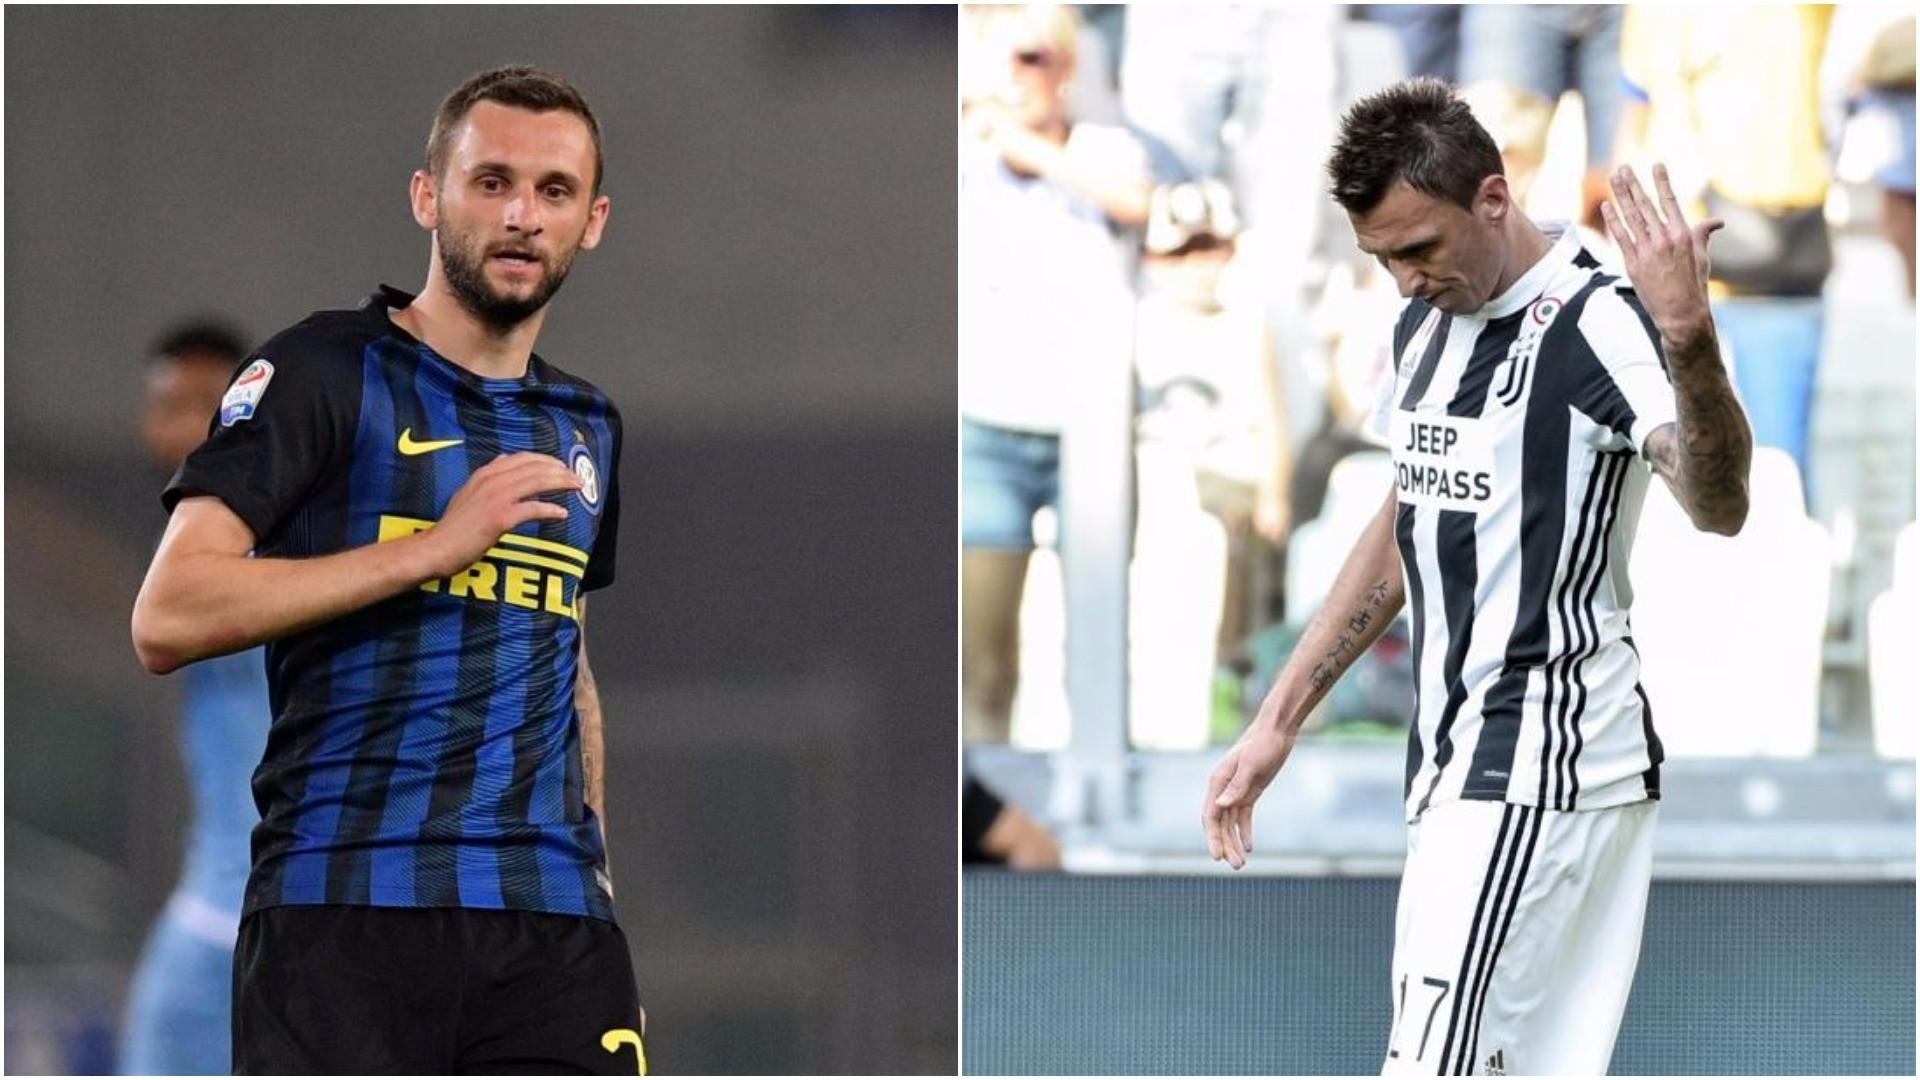 Inter e Juve tremano: Brozovic e Mandzukic ko dopo Croazia-Finlandia